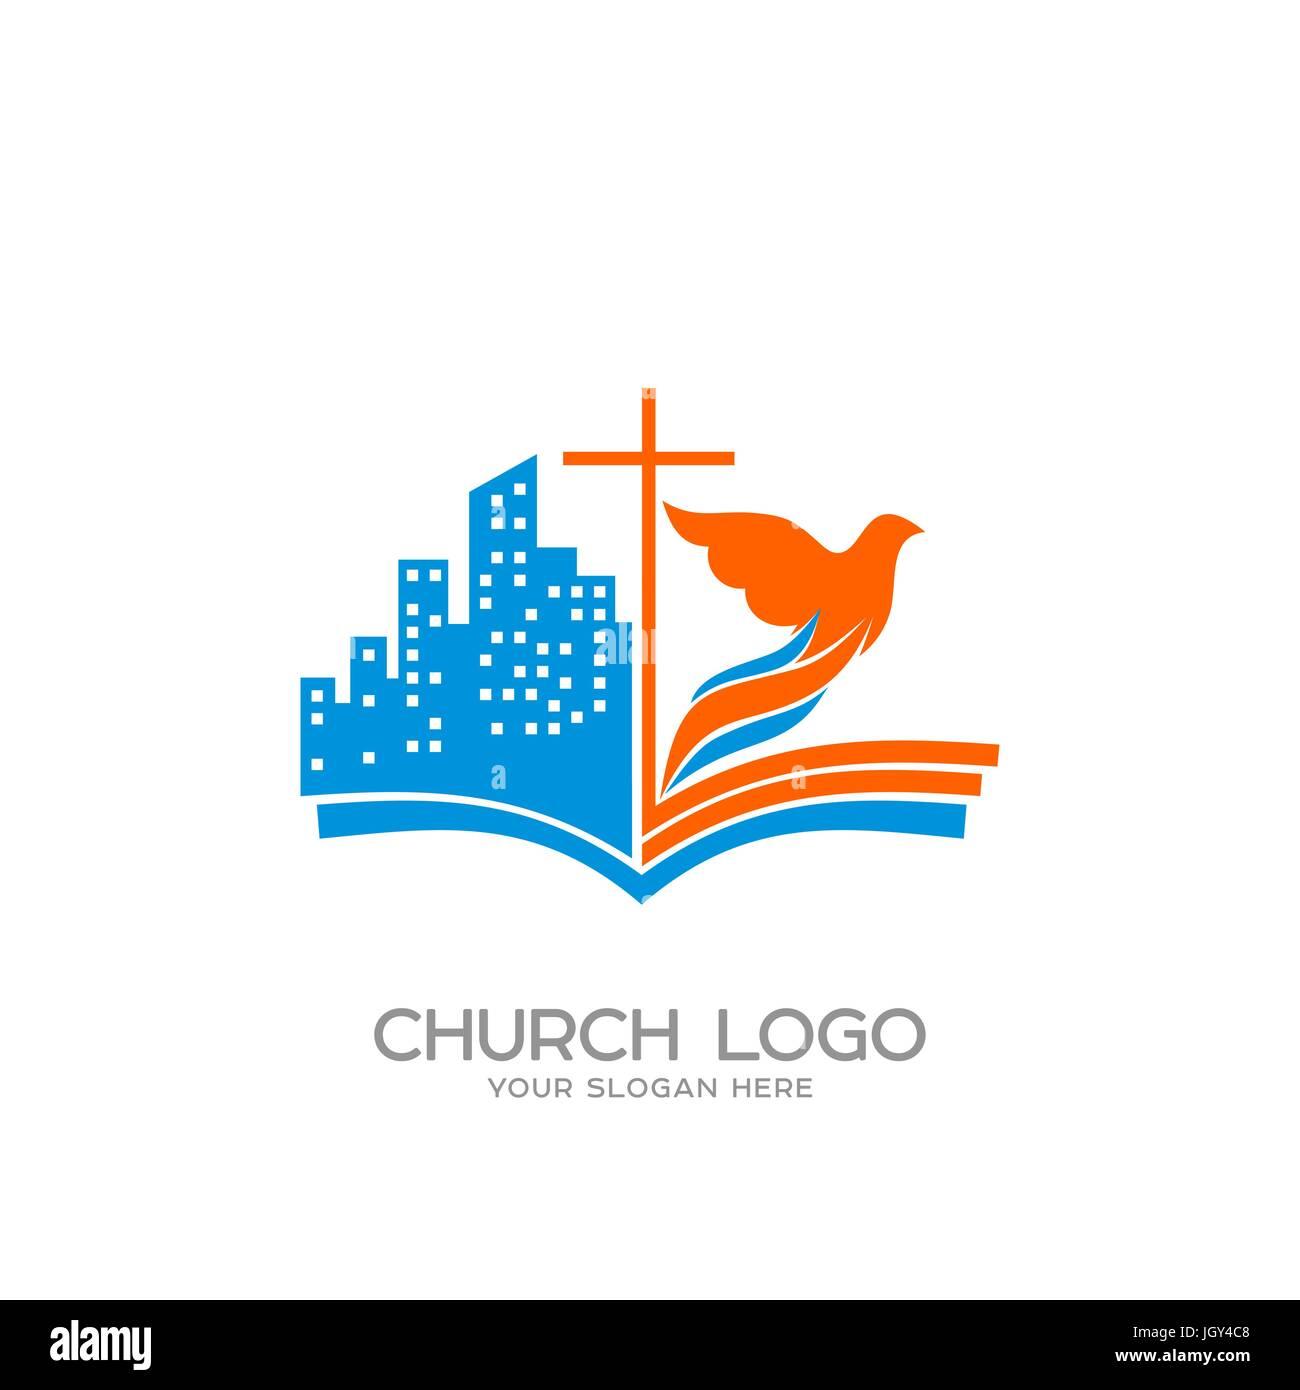 Church logo christian symbols the open bible the cross of jesus church logo christian symbols the open bible the cross of jesus the city and the dove thecheapjerseys Gallery